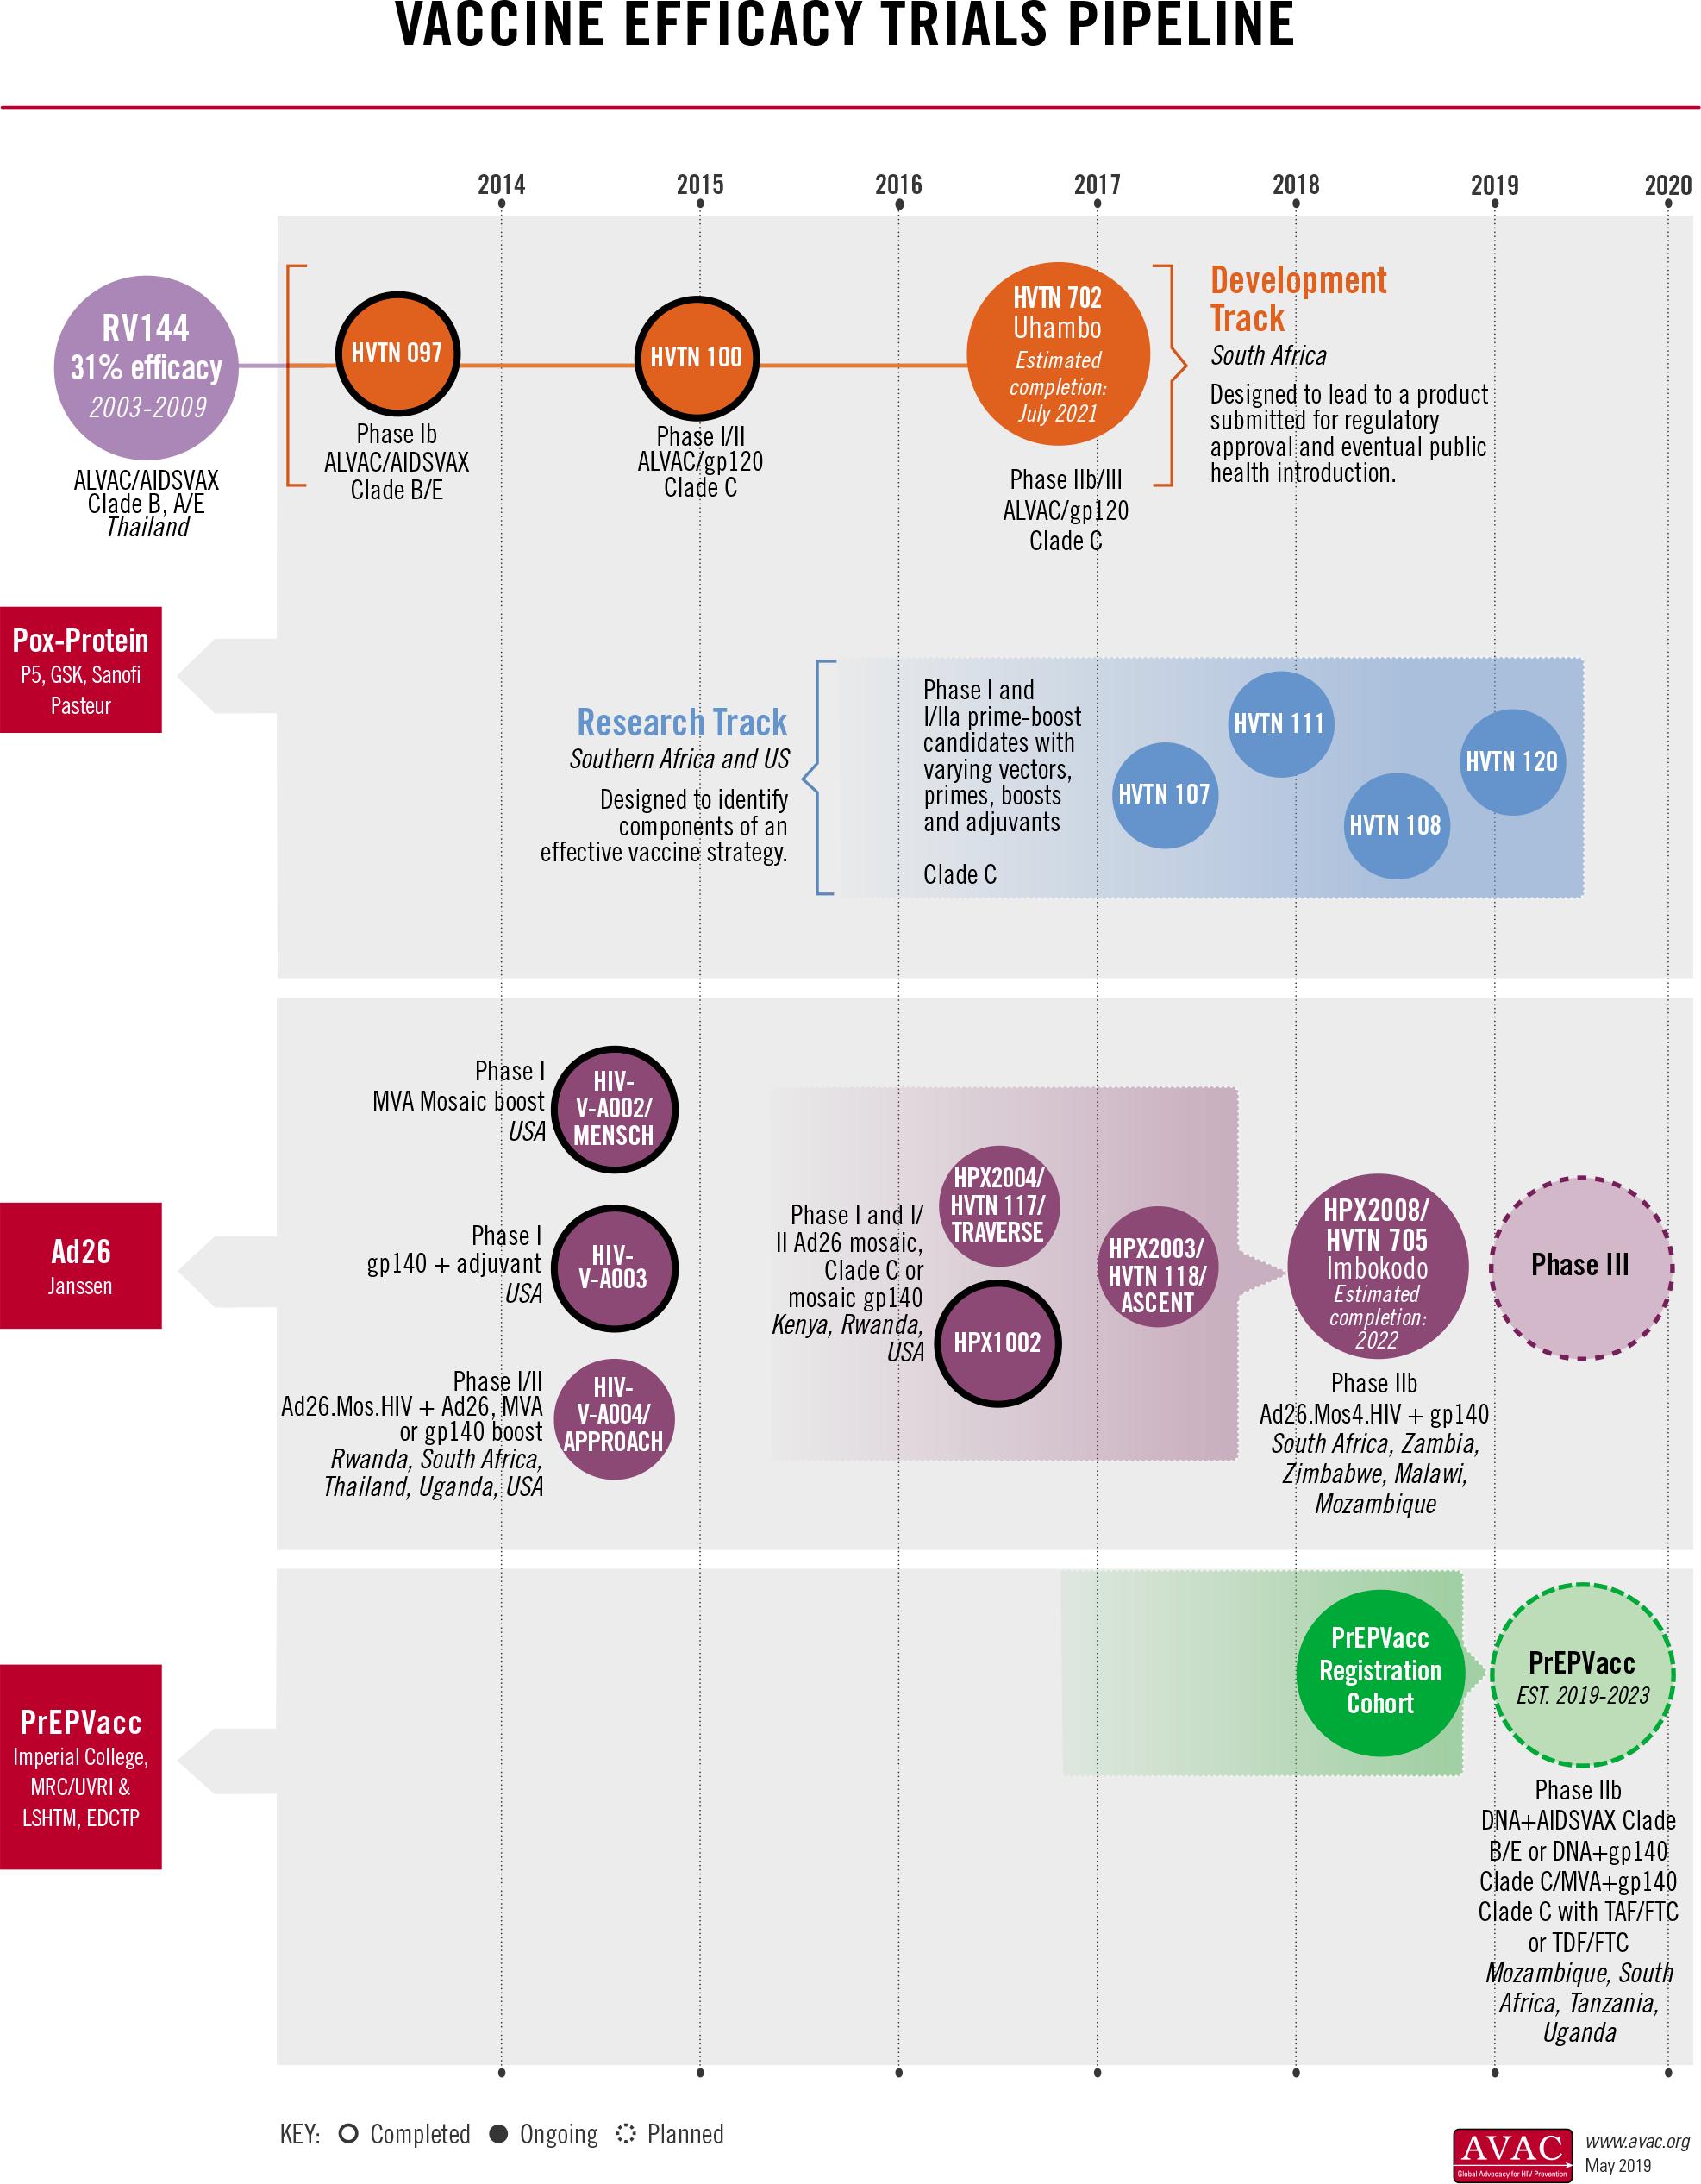 hiv prevention vaccine pipeline 01 - Johnson & Johnson проверит вакцину против ВИЧ среди геев